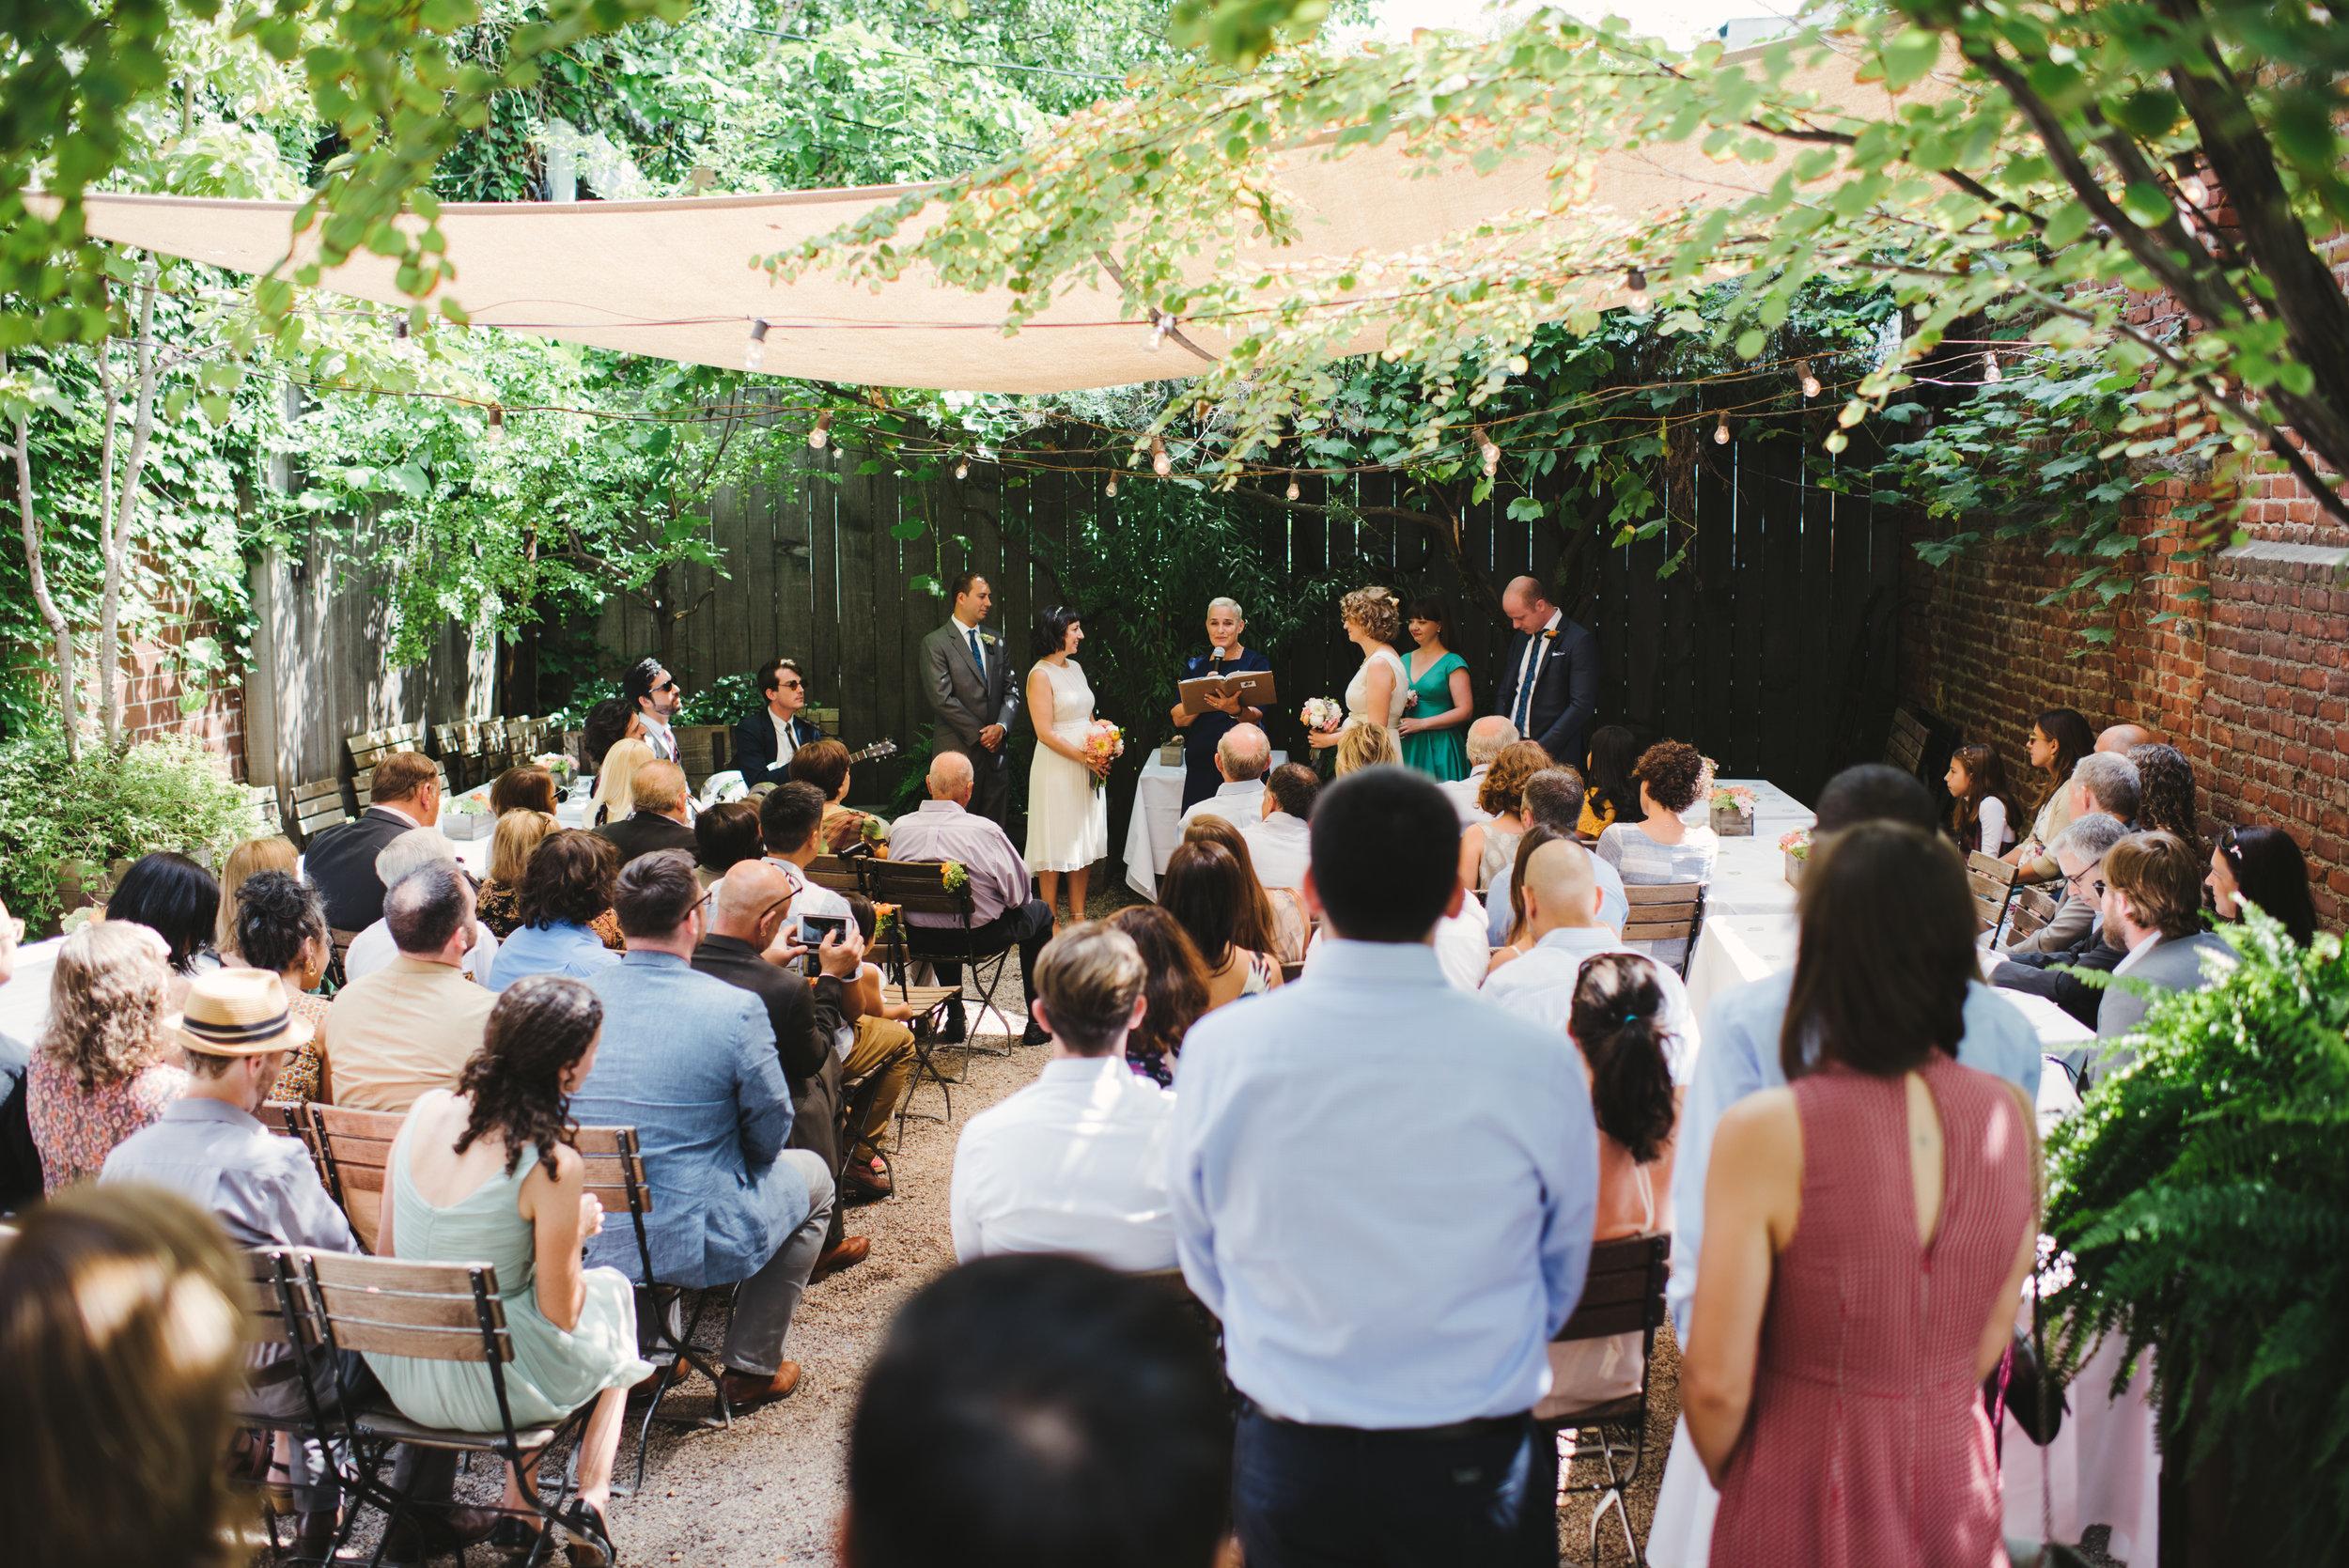 NANCY & CARA - FRANKIES 457 SPUNTINO - BROOKLYN INTIMATE WEDDING by CHI-CHI ARI-175.jpg